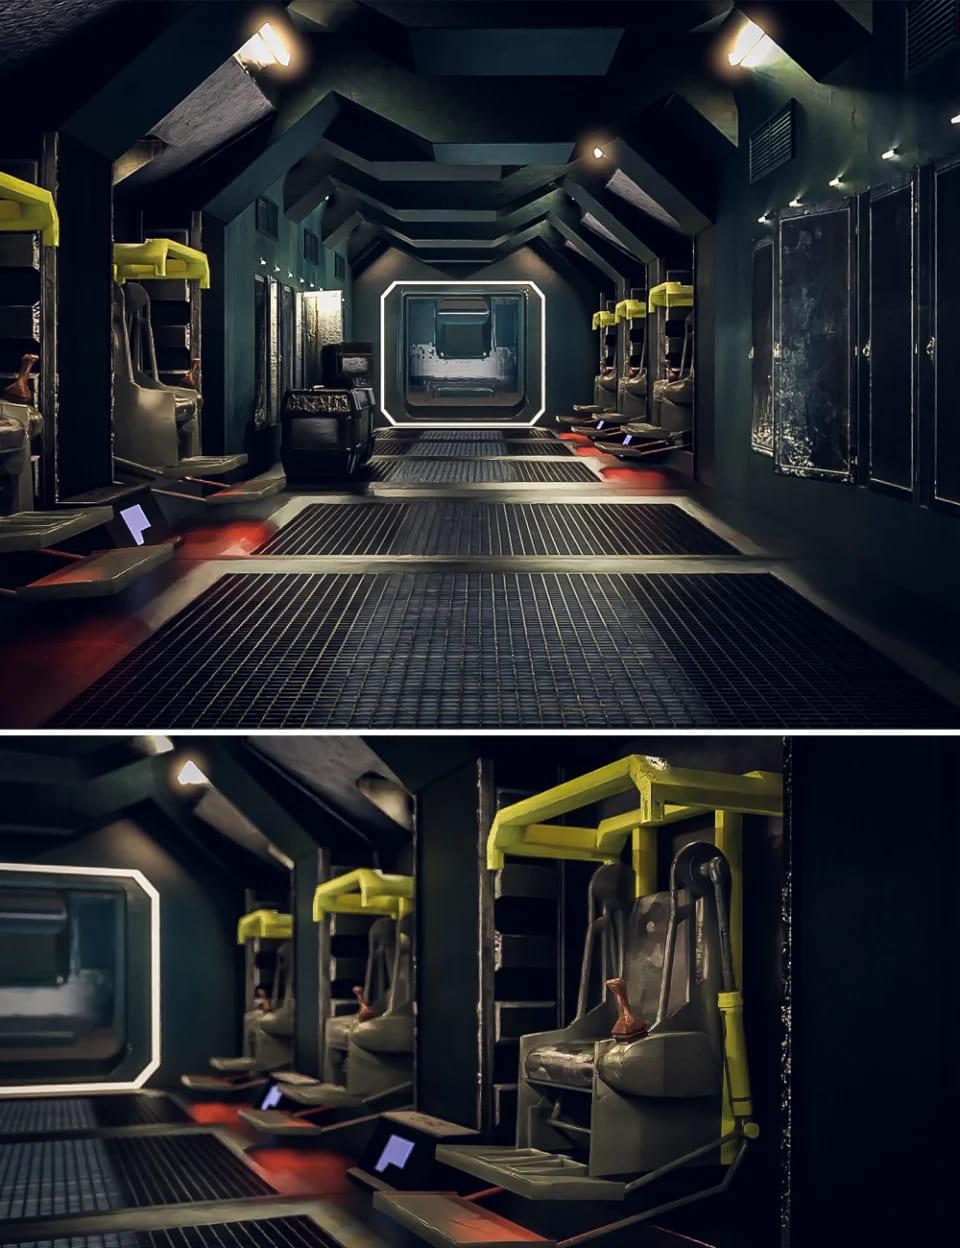 Discharge Sci-Fi Room_DAZ3D下载站